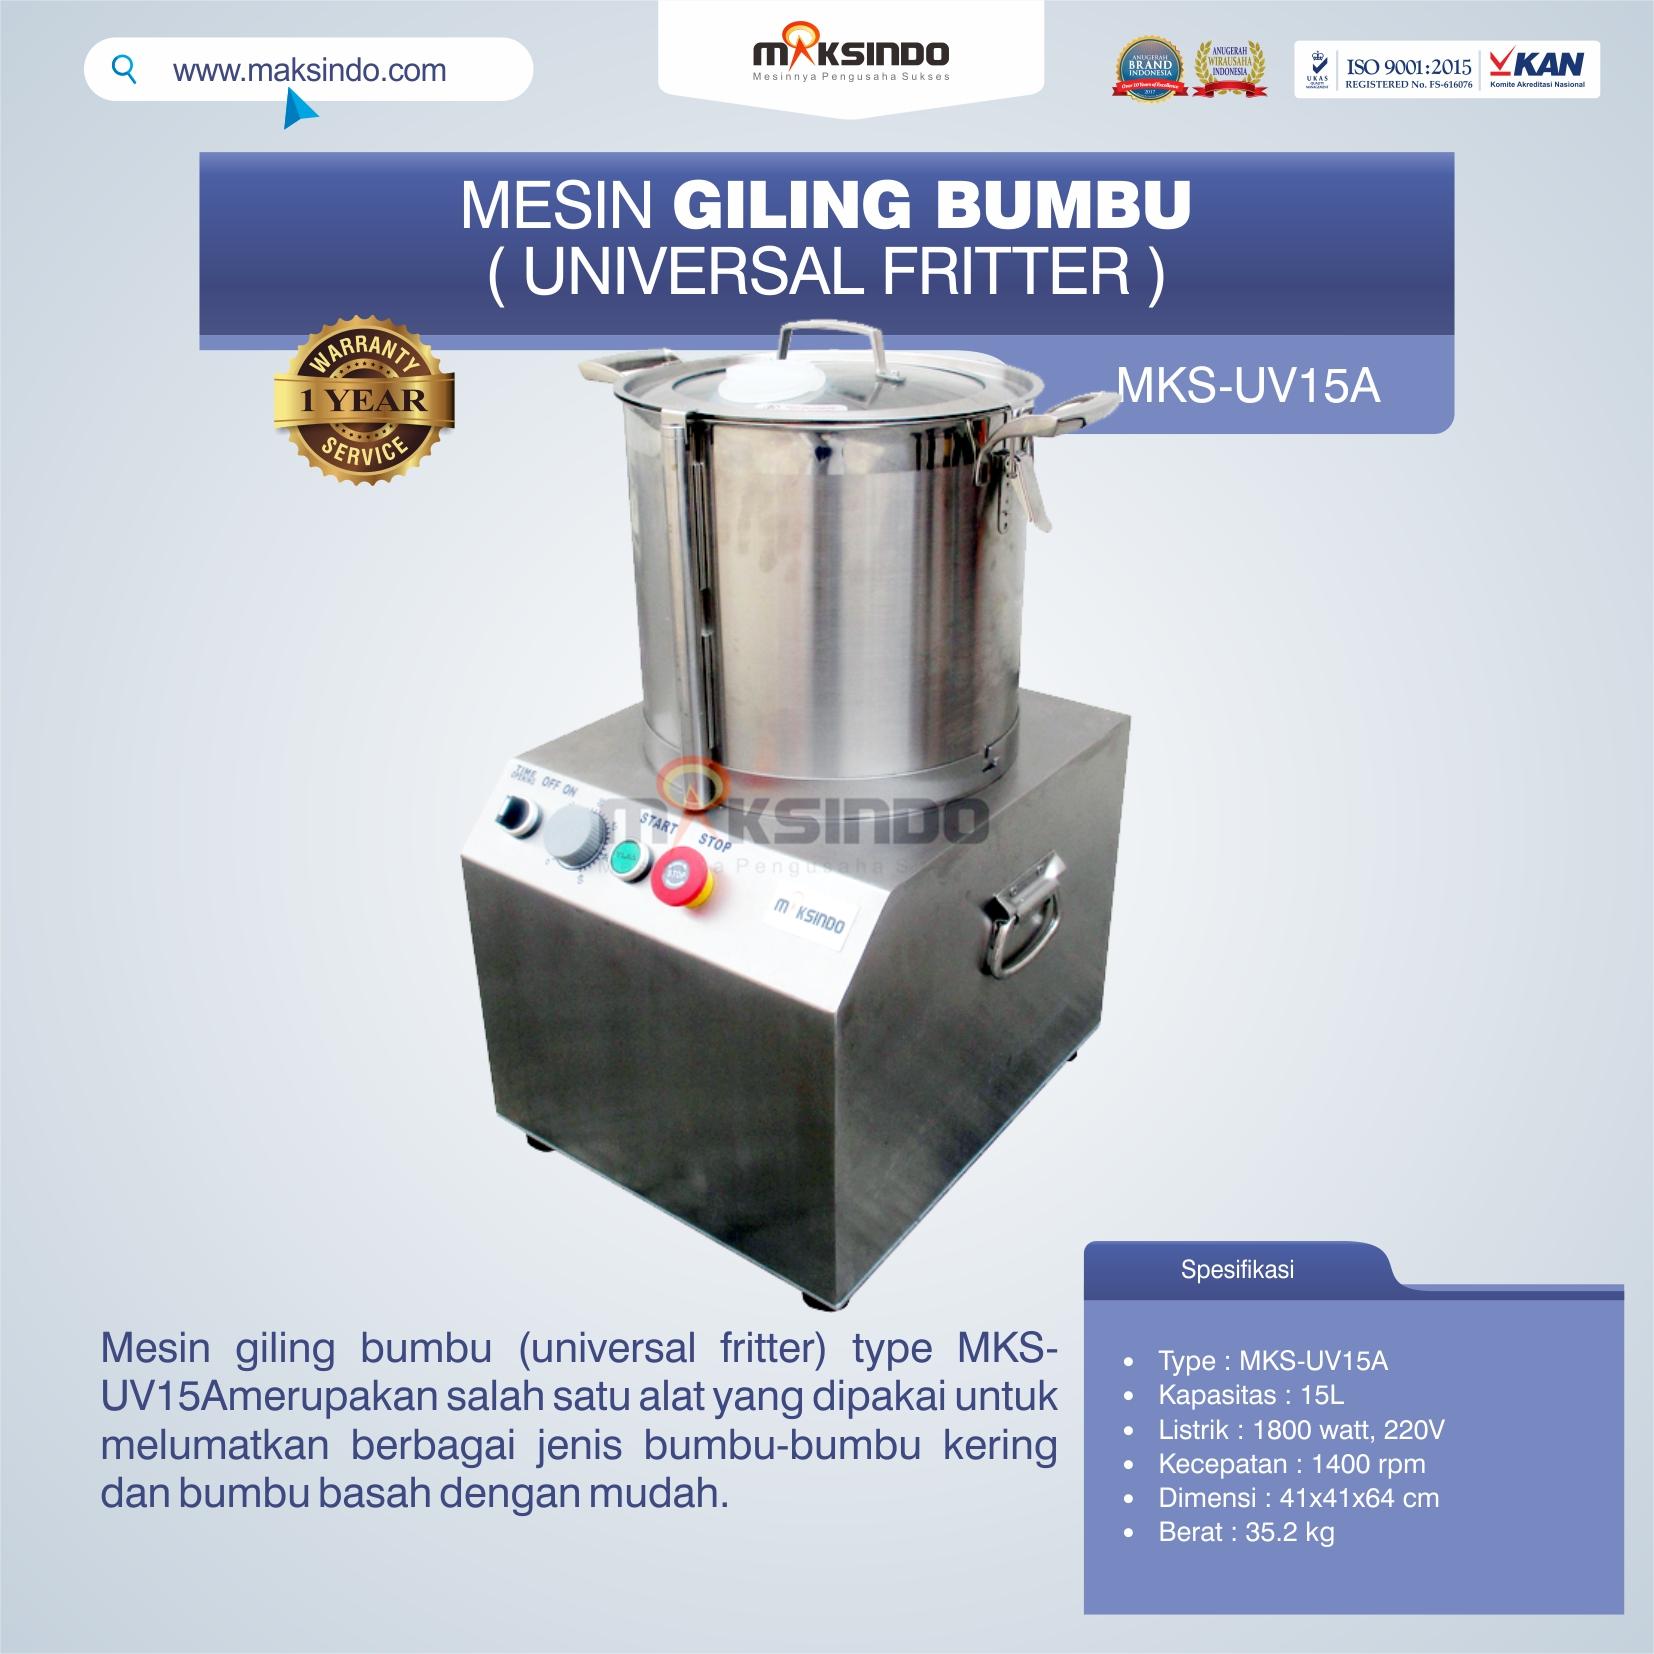 Jual Mesin Giling Bumbu (Universal Fritter) MKS-UV15A di Medan